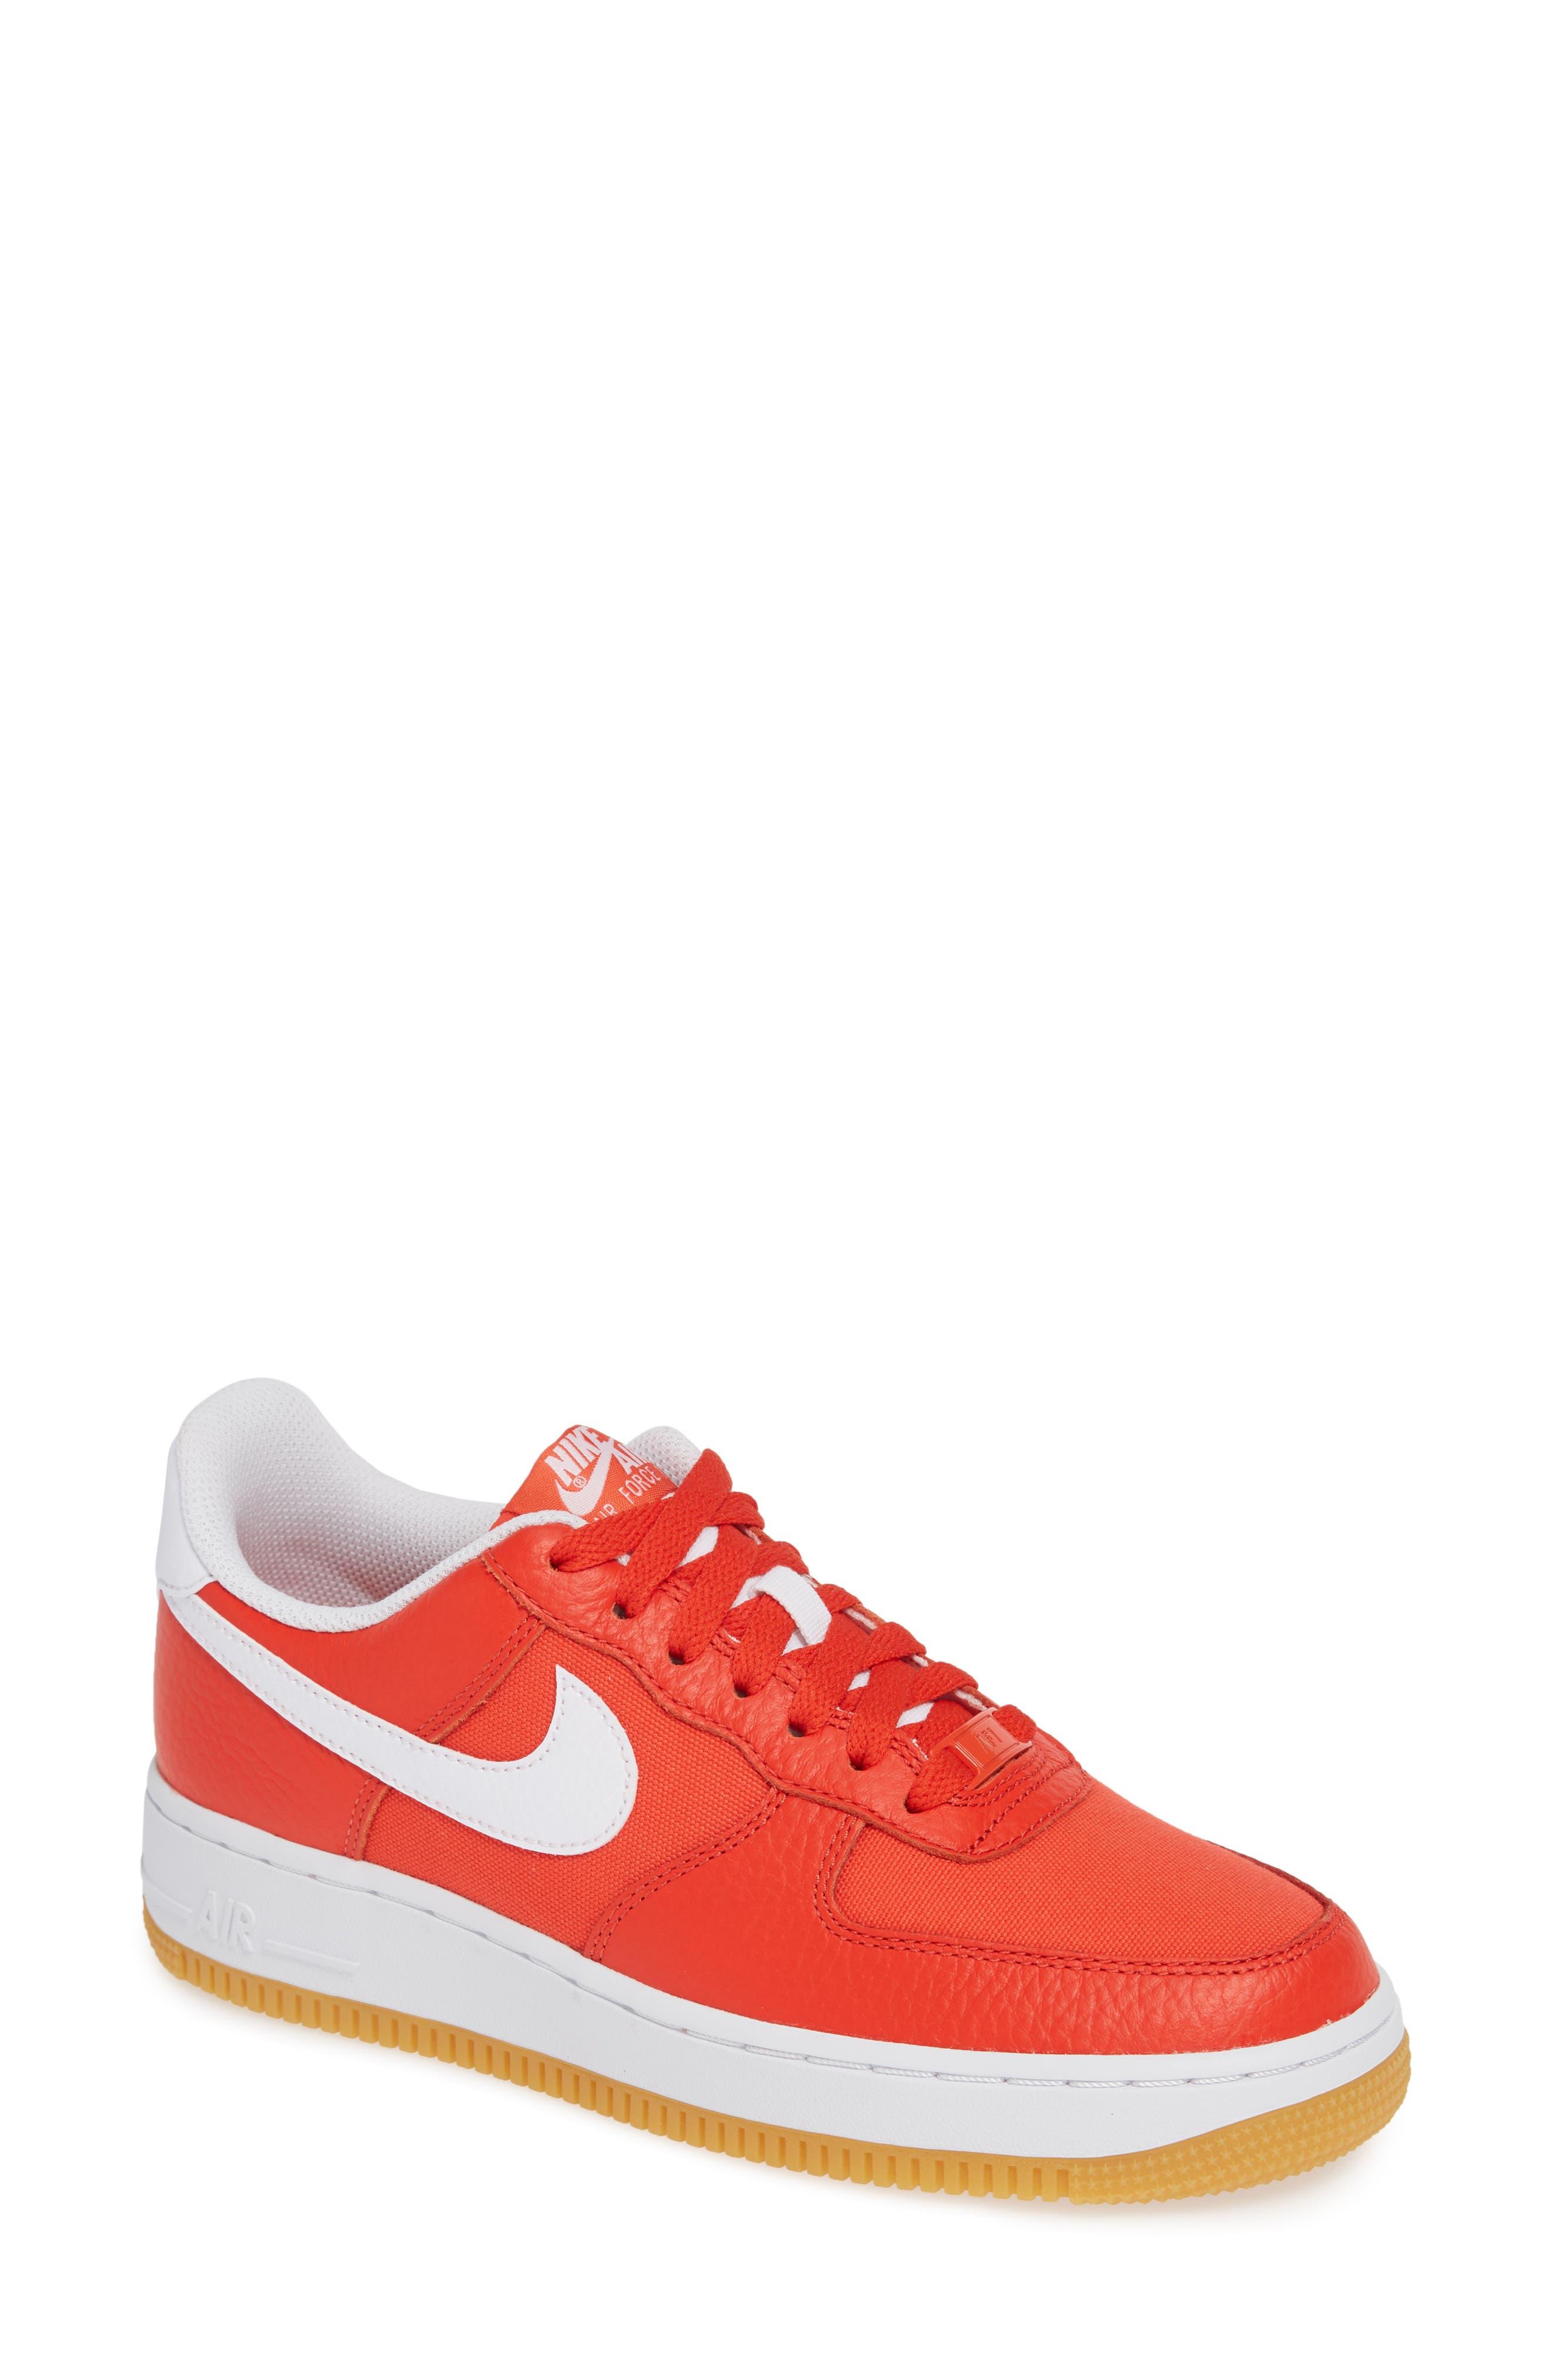 Air Force 1 '07 Premium Sneaker,                             Main thumbnail 1, color,                             Red/ White/ Light Brown